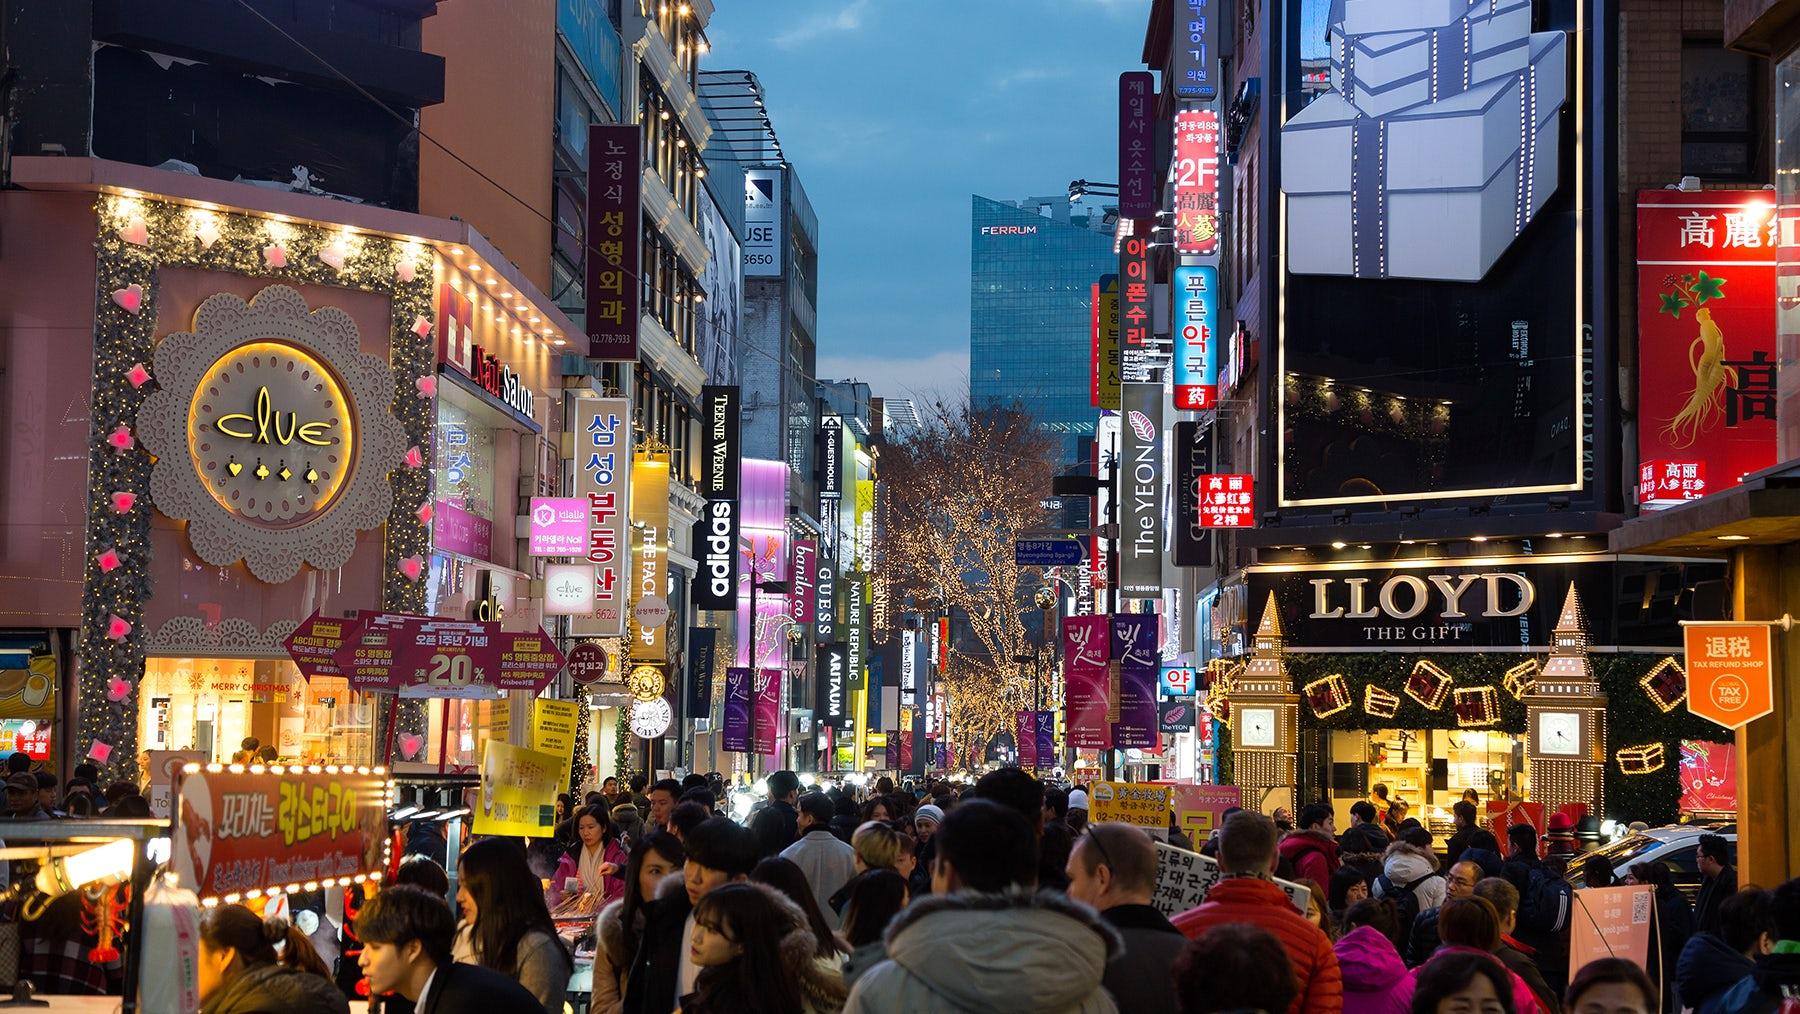 Myeongdong shopping street in Seoul | Source: Shutterstock